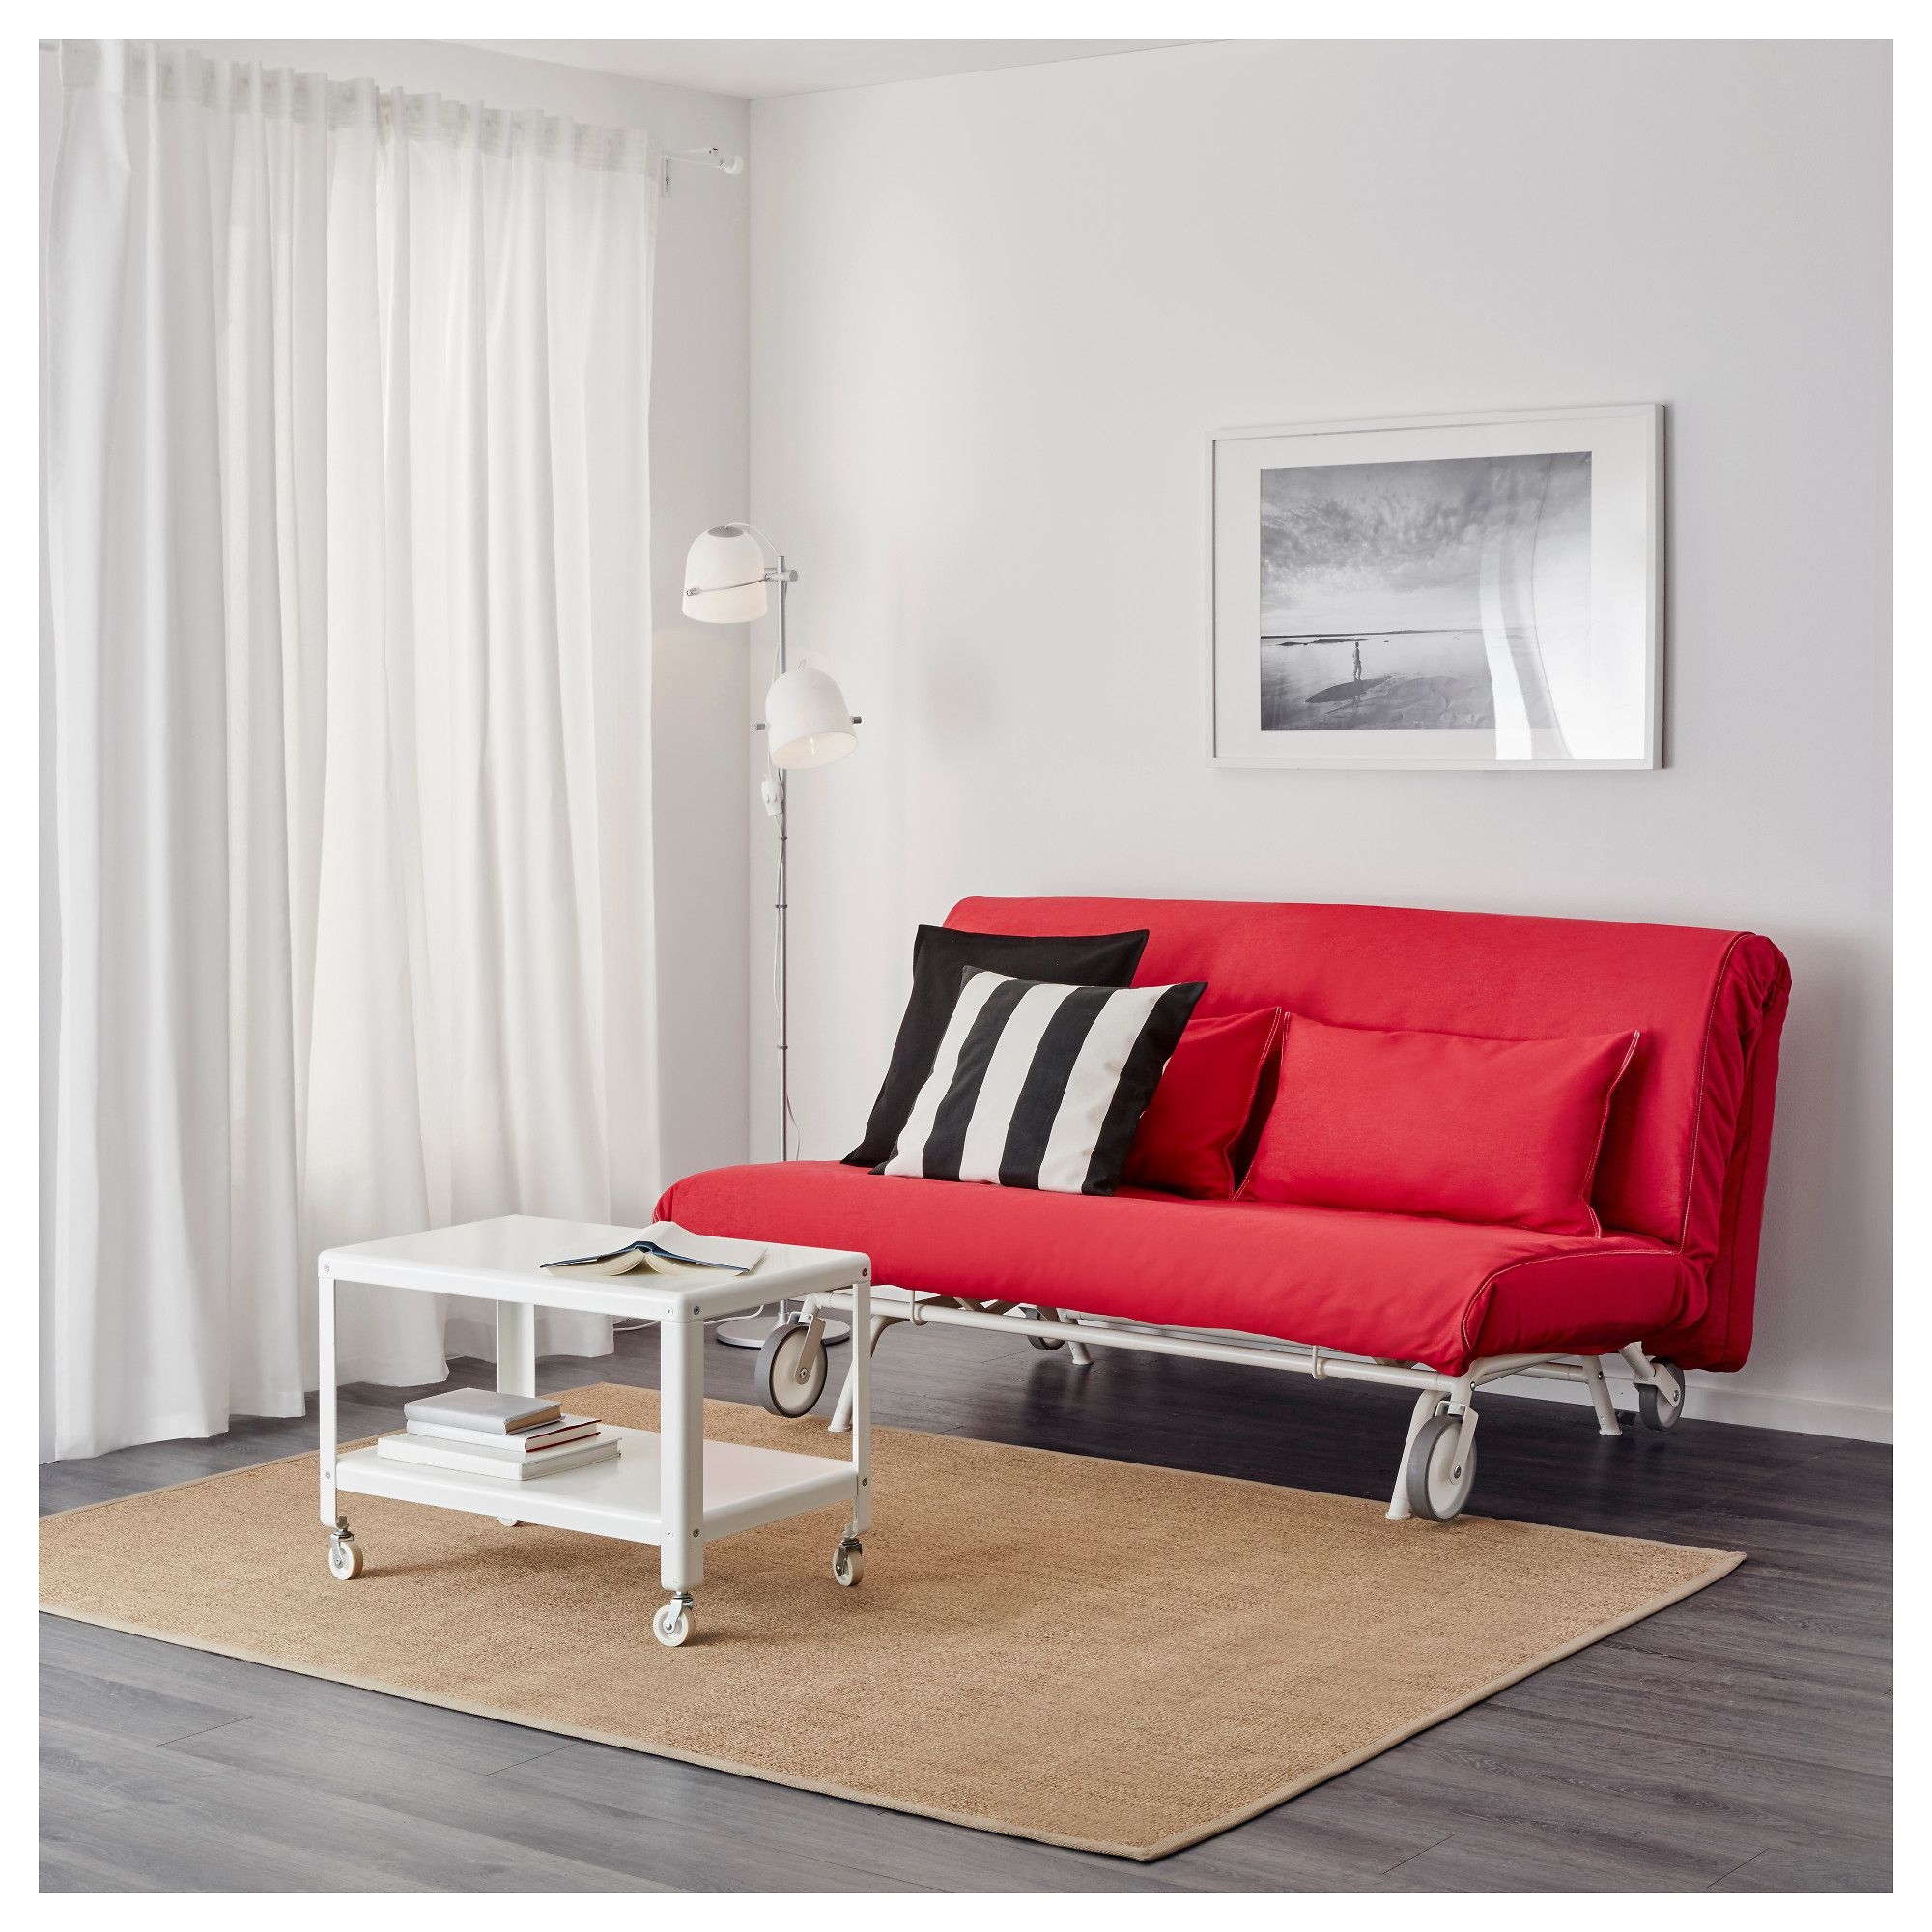 Zetelbed 2 Personen Ikea.Firm Couch Living Room Sofa Ikea Bed Ikea Ps Sofa Bed